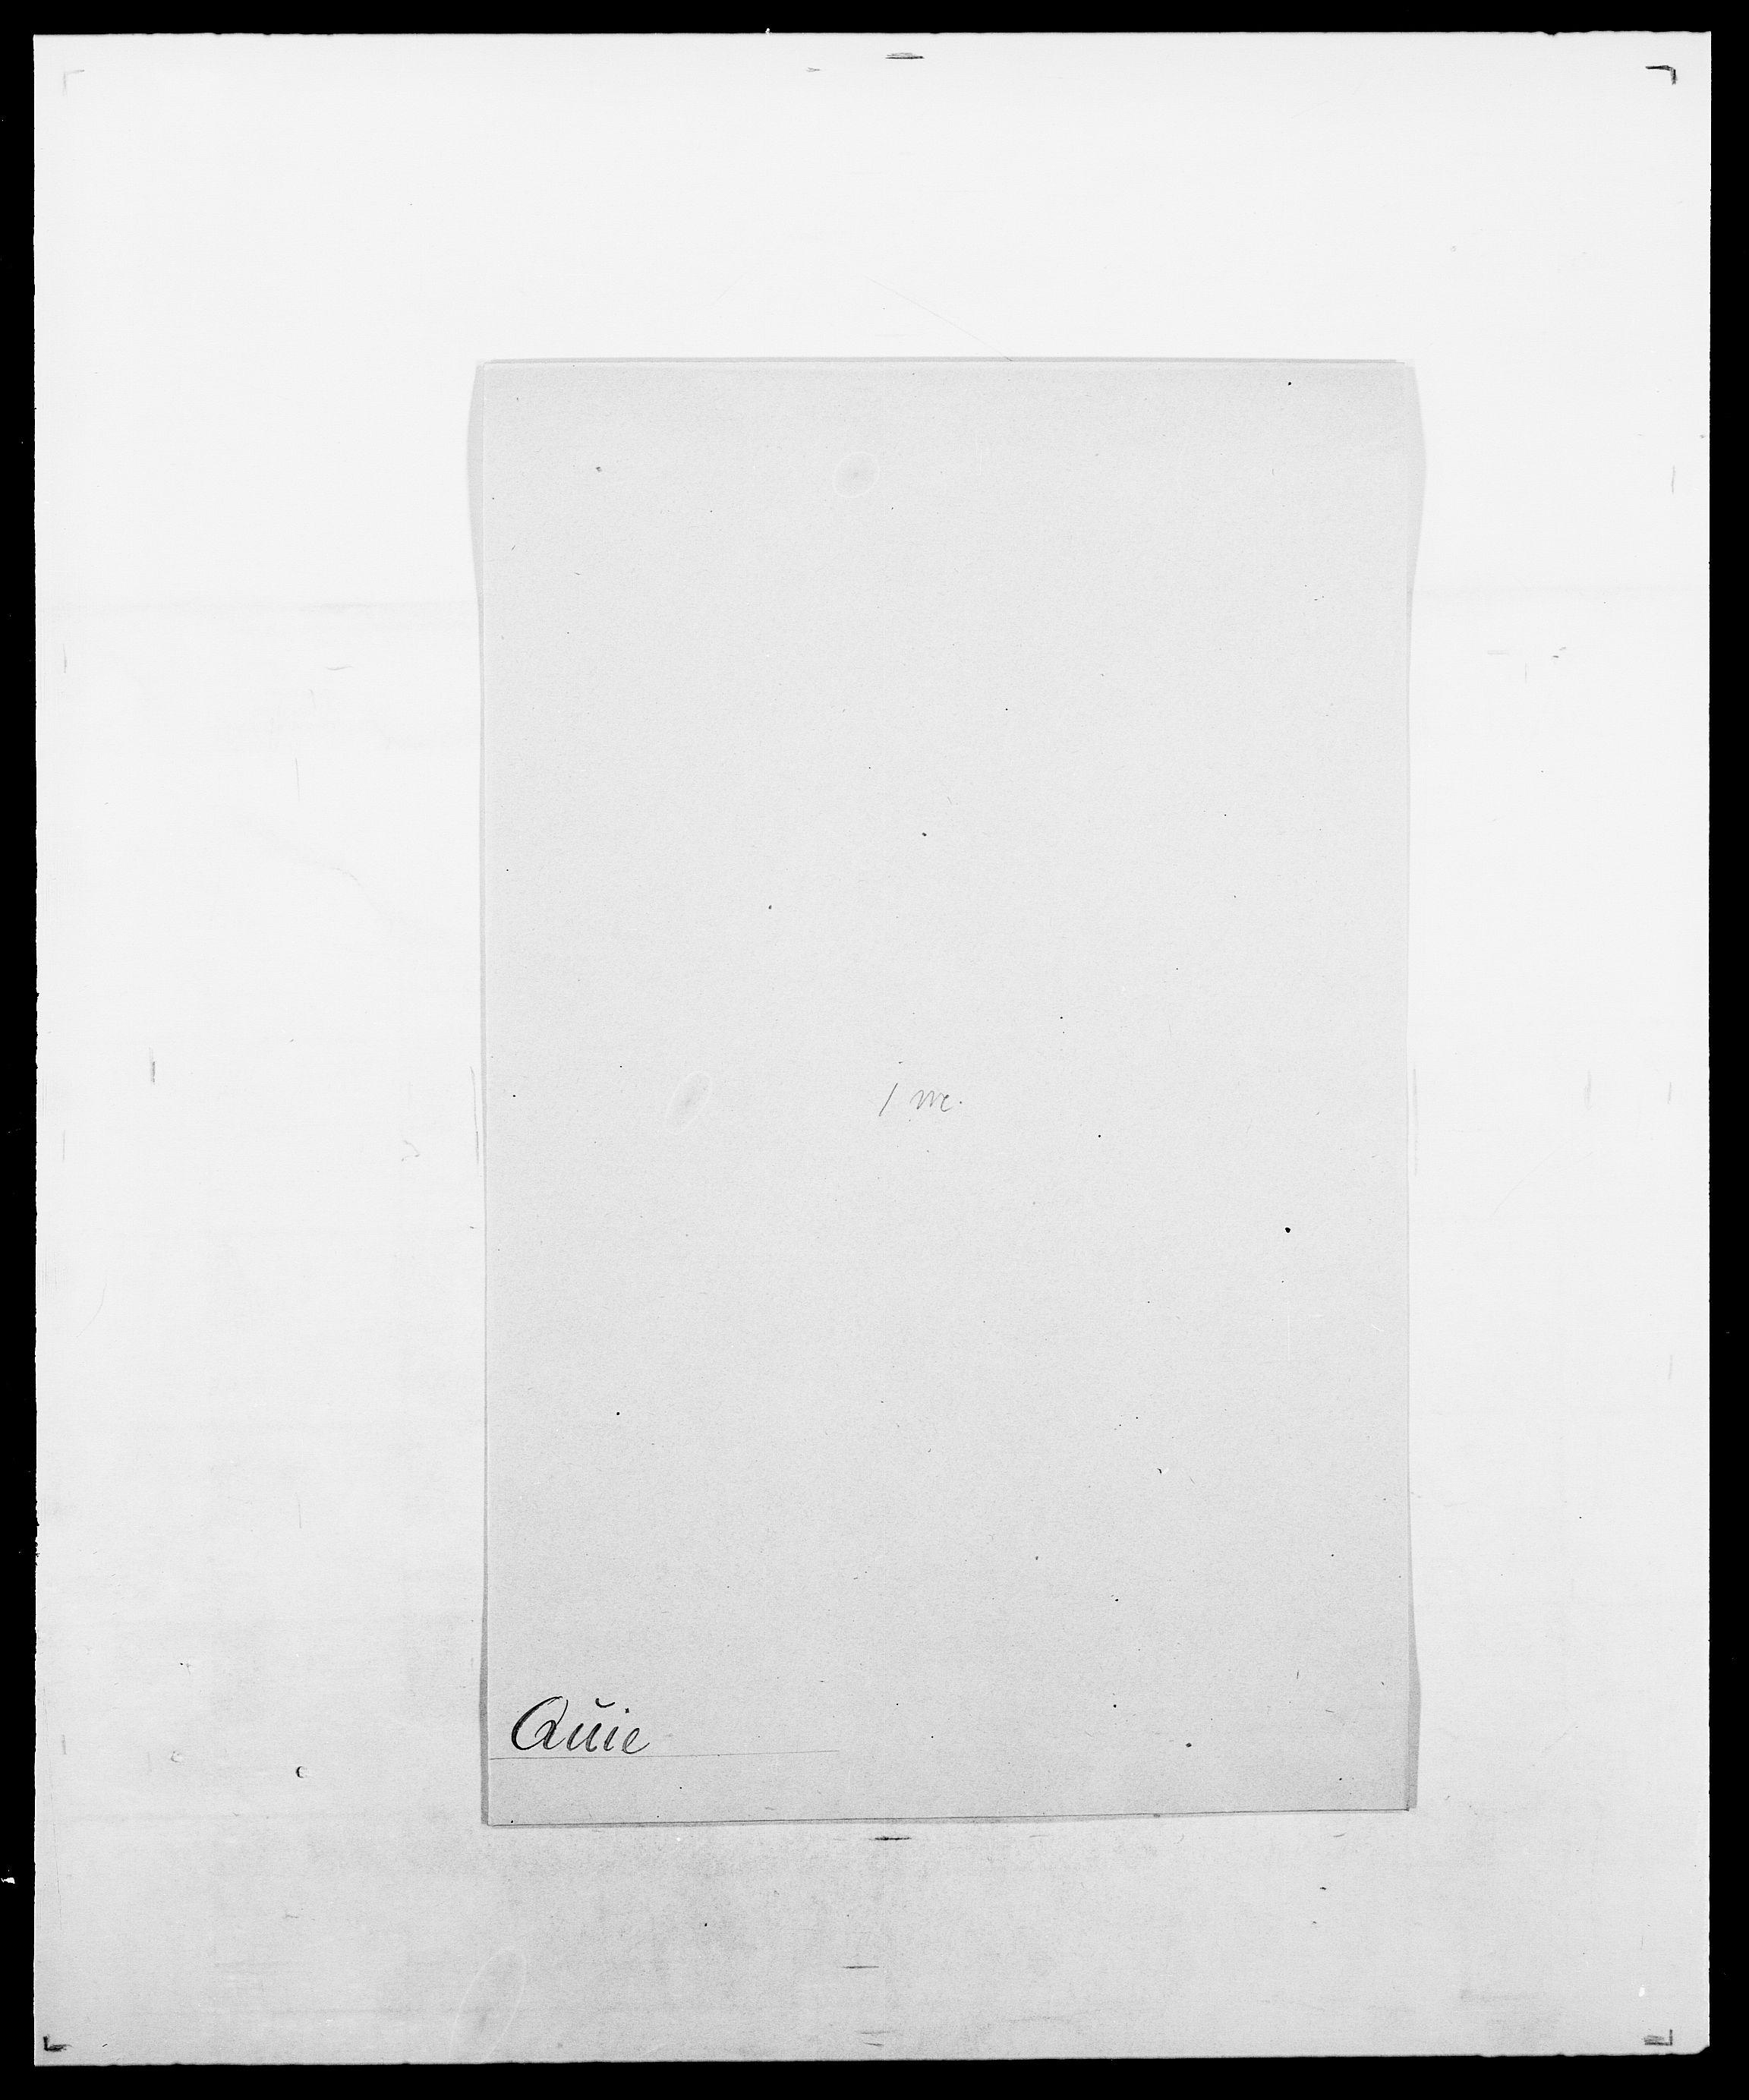 SAO, Delgobe, Charles Antoine - samling, D/Da/L0031: de Place - Raaum, s. 480